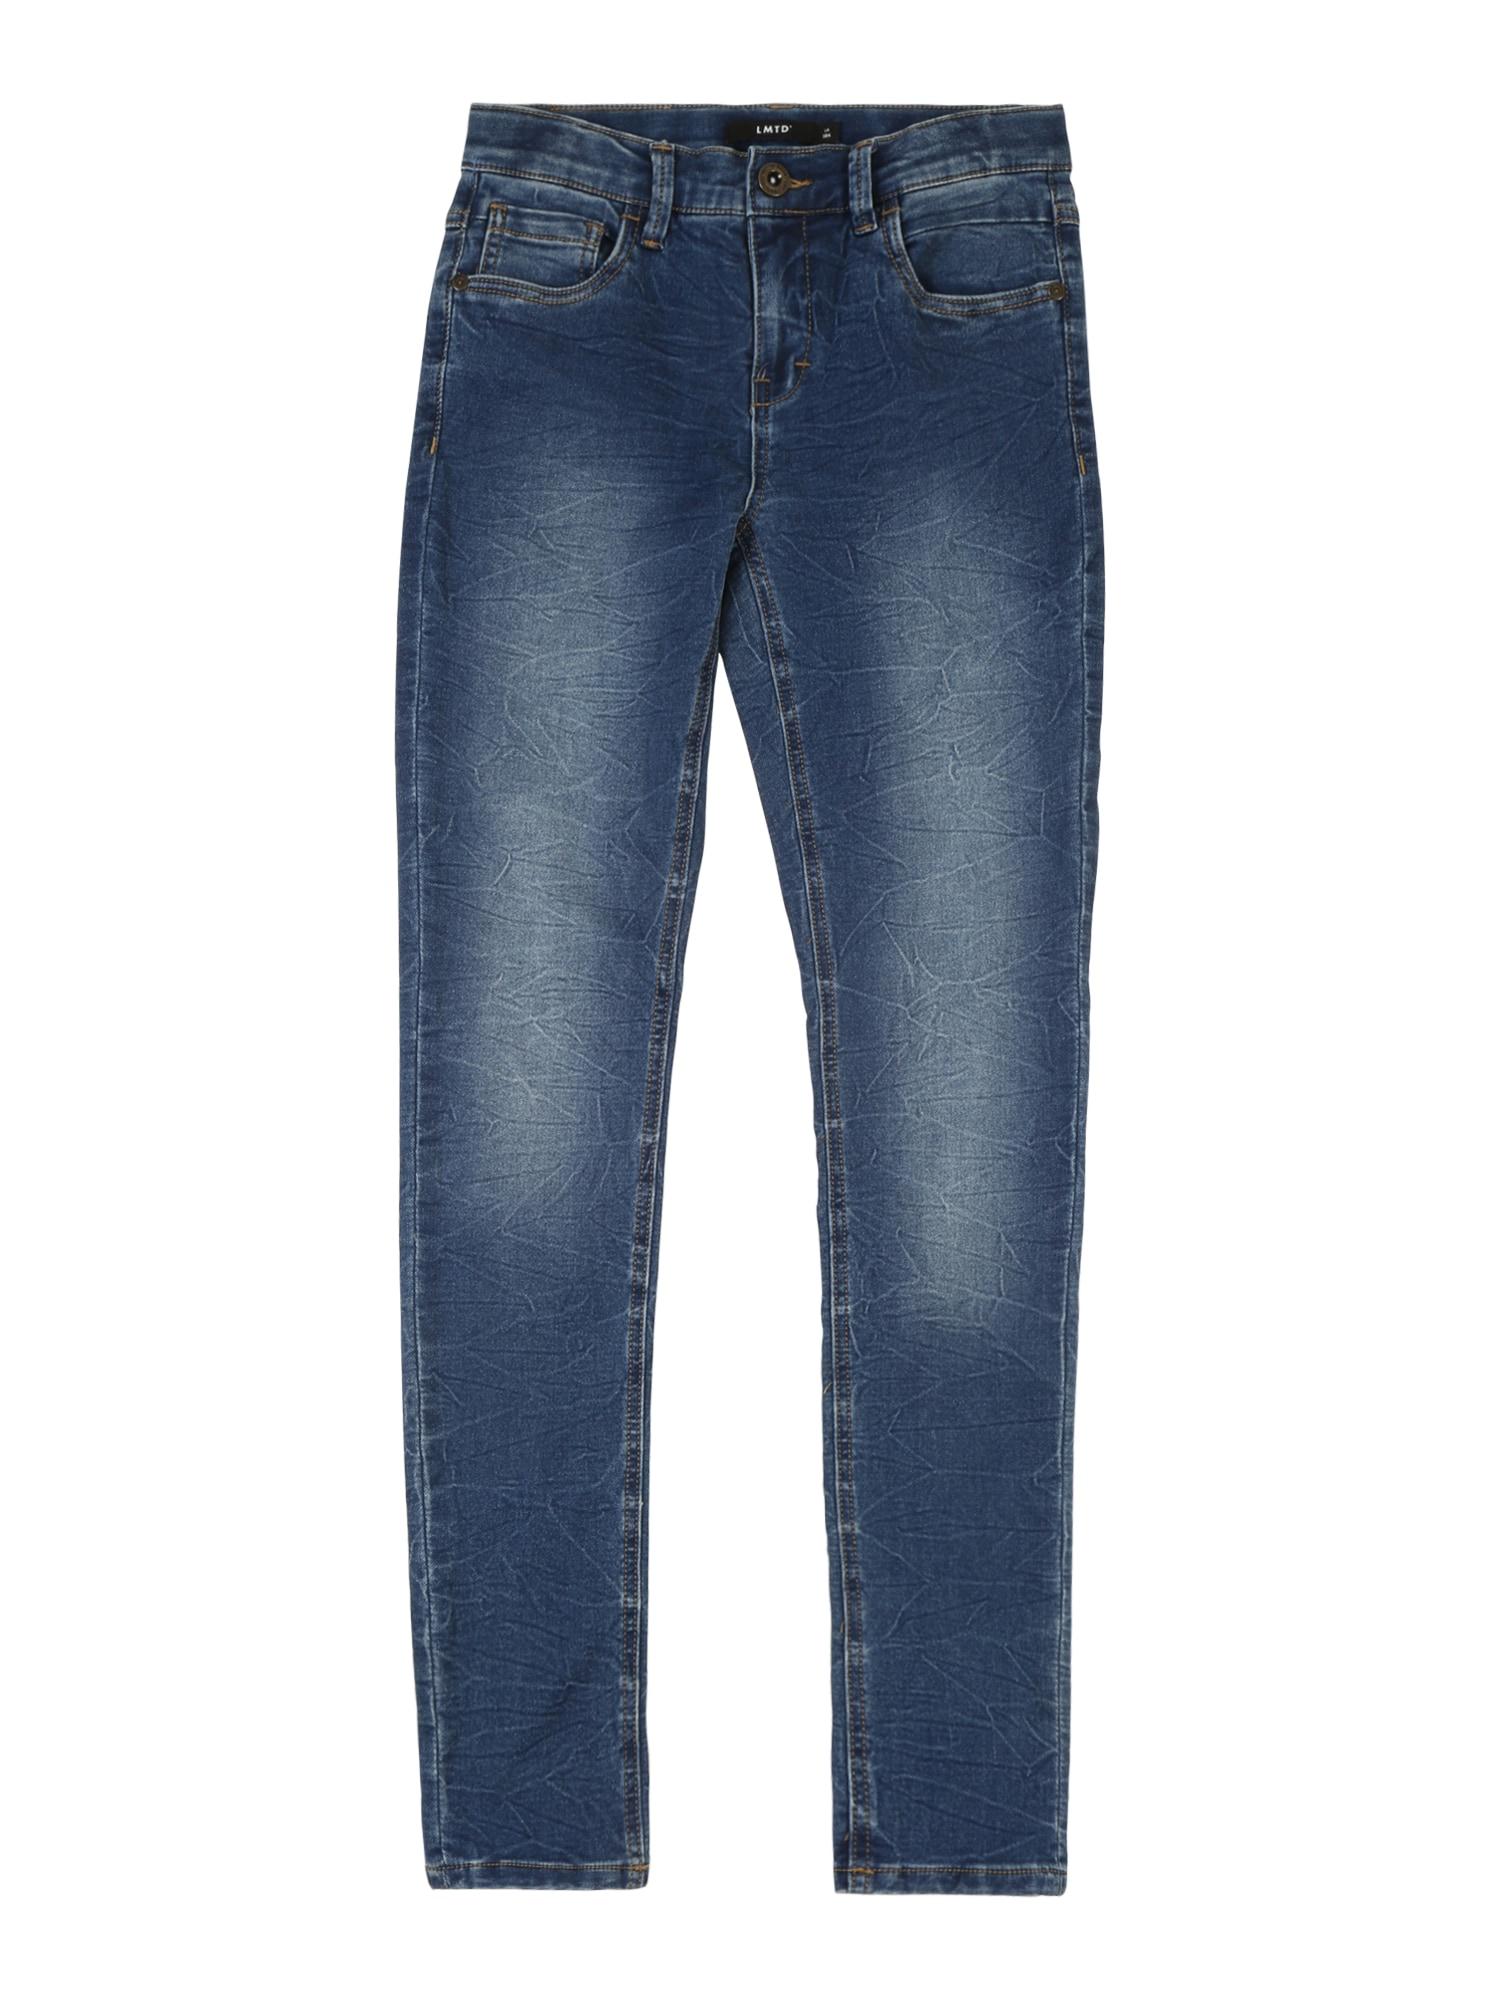 LMTD Džinsai tamsiai (džinso) mėlyna